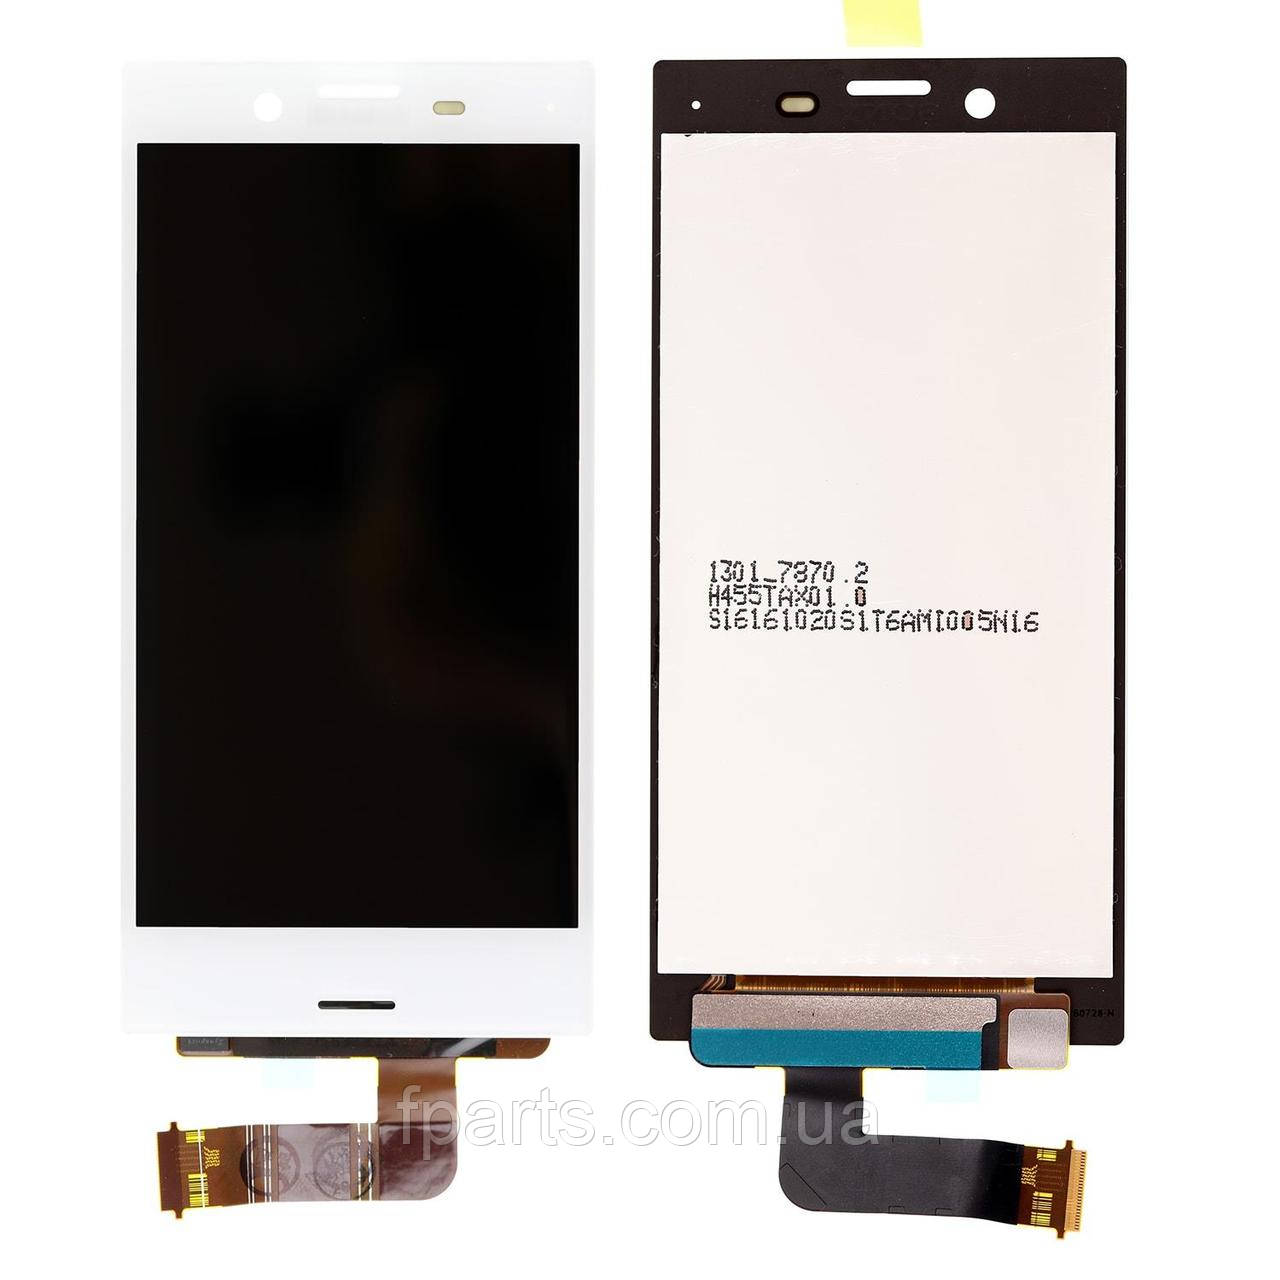 Дисплей для Sony Xperia X Compact F5321 с тачскрином (White)